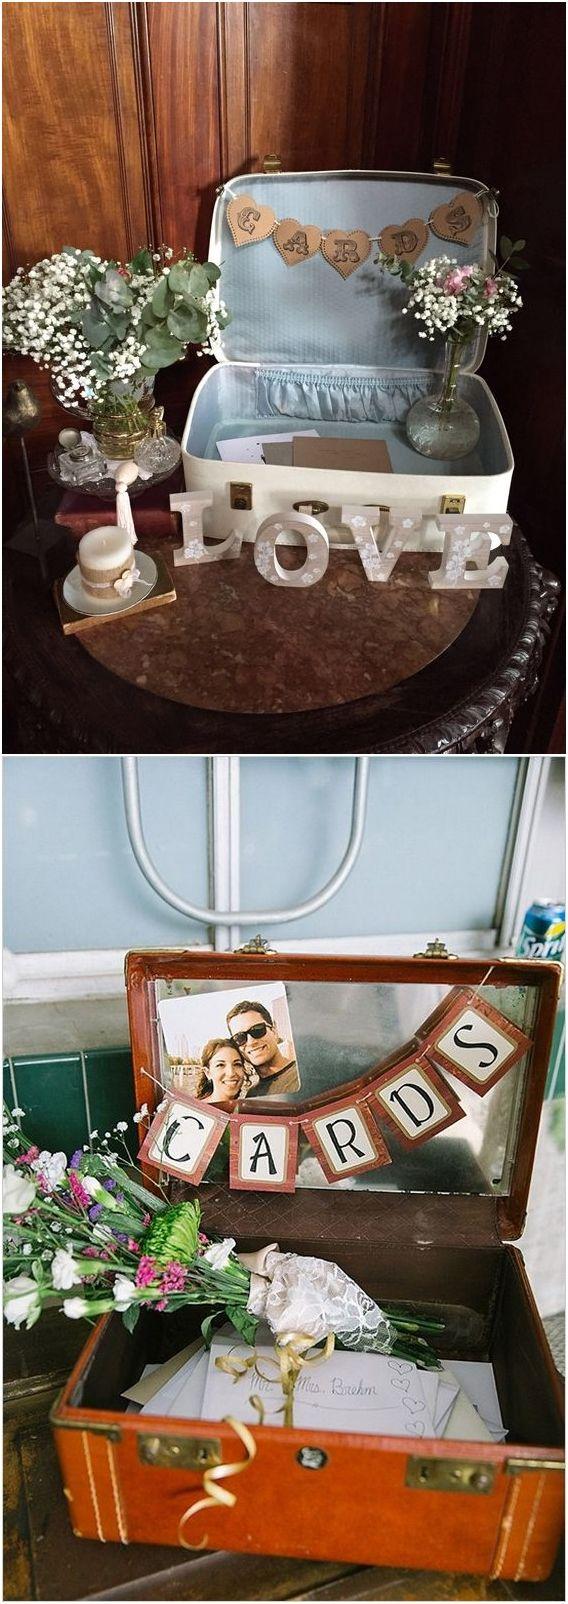 Top 20 Vintage Suitcase Wedding Decor Ideas #vintagesuitcasewedding